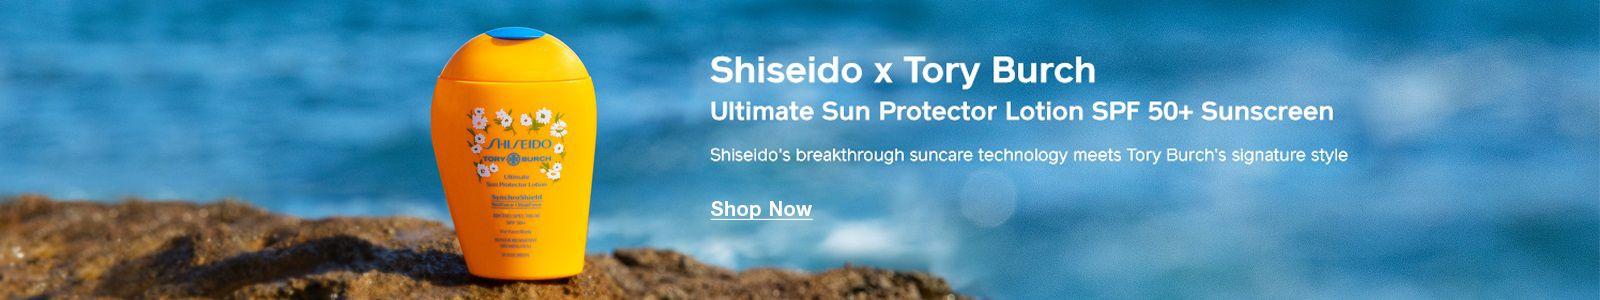 Shiseido x Tory Bunch, Ultimate Sun Protector Lotion SPF 50+ Sunscreen